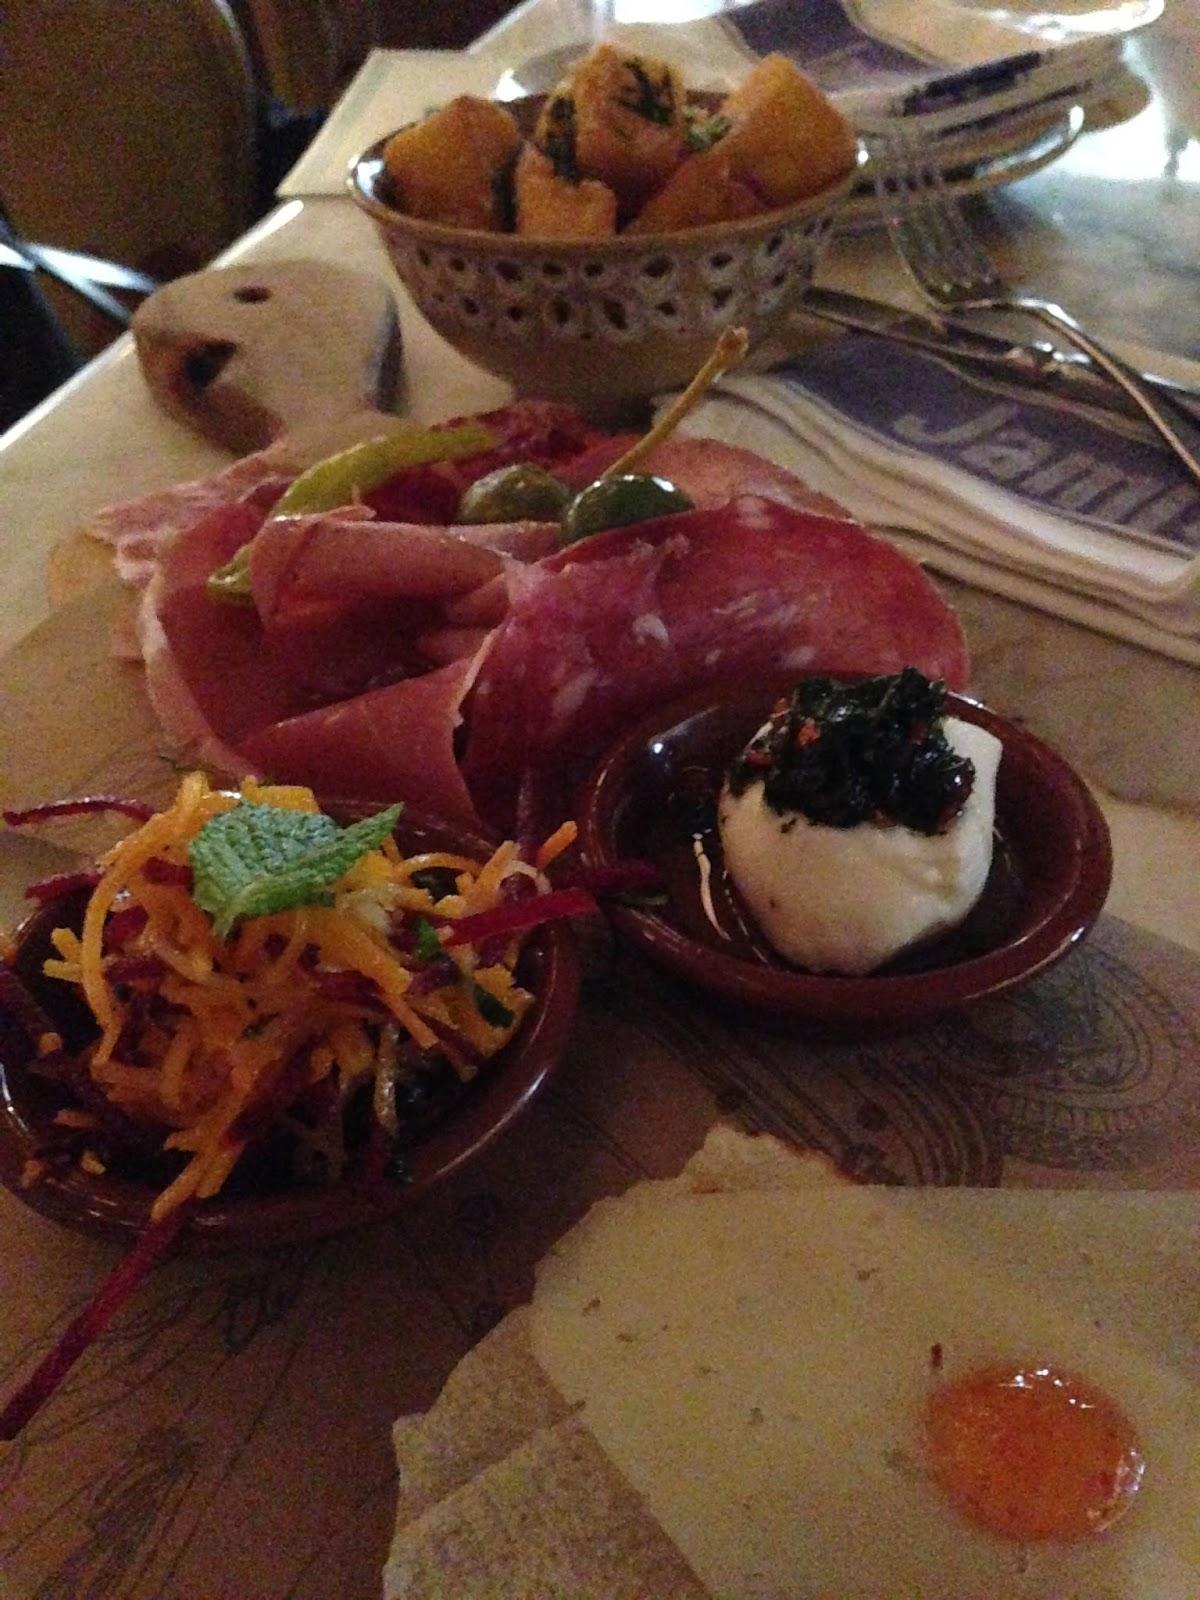 jamie's, italian, restaurant, bar, plank, antipasto, prosciutto, mortadella, meats, smallgoods, adelaide, food